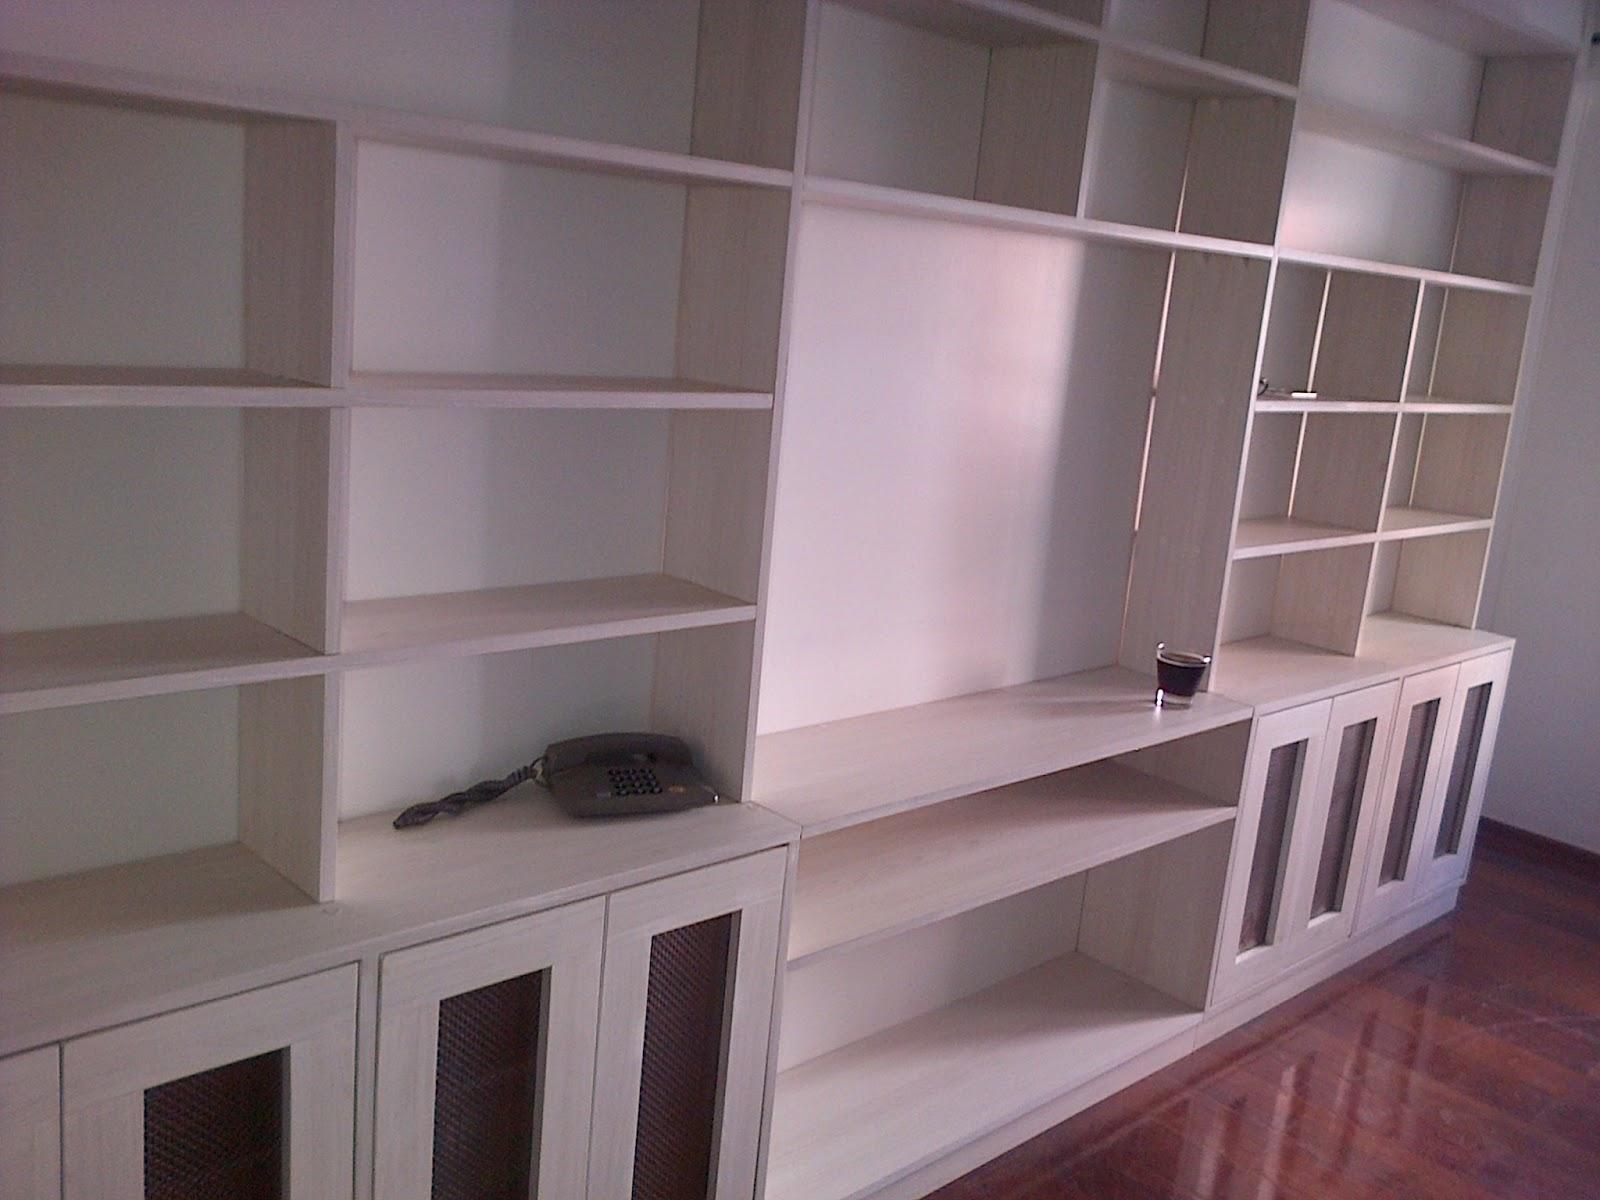 Bibliotecas de madera biblioteca mts ancho biblioteca - Biblioteca madera blanca ...